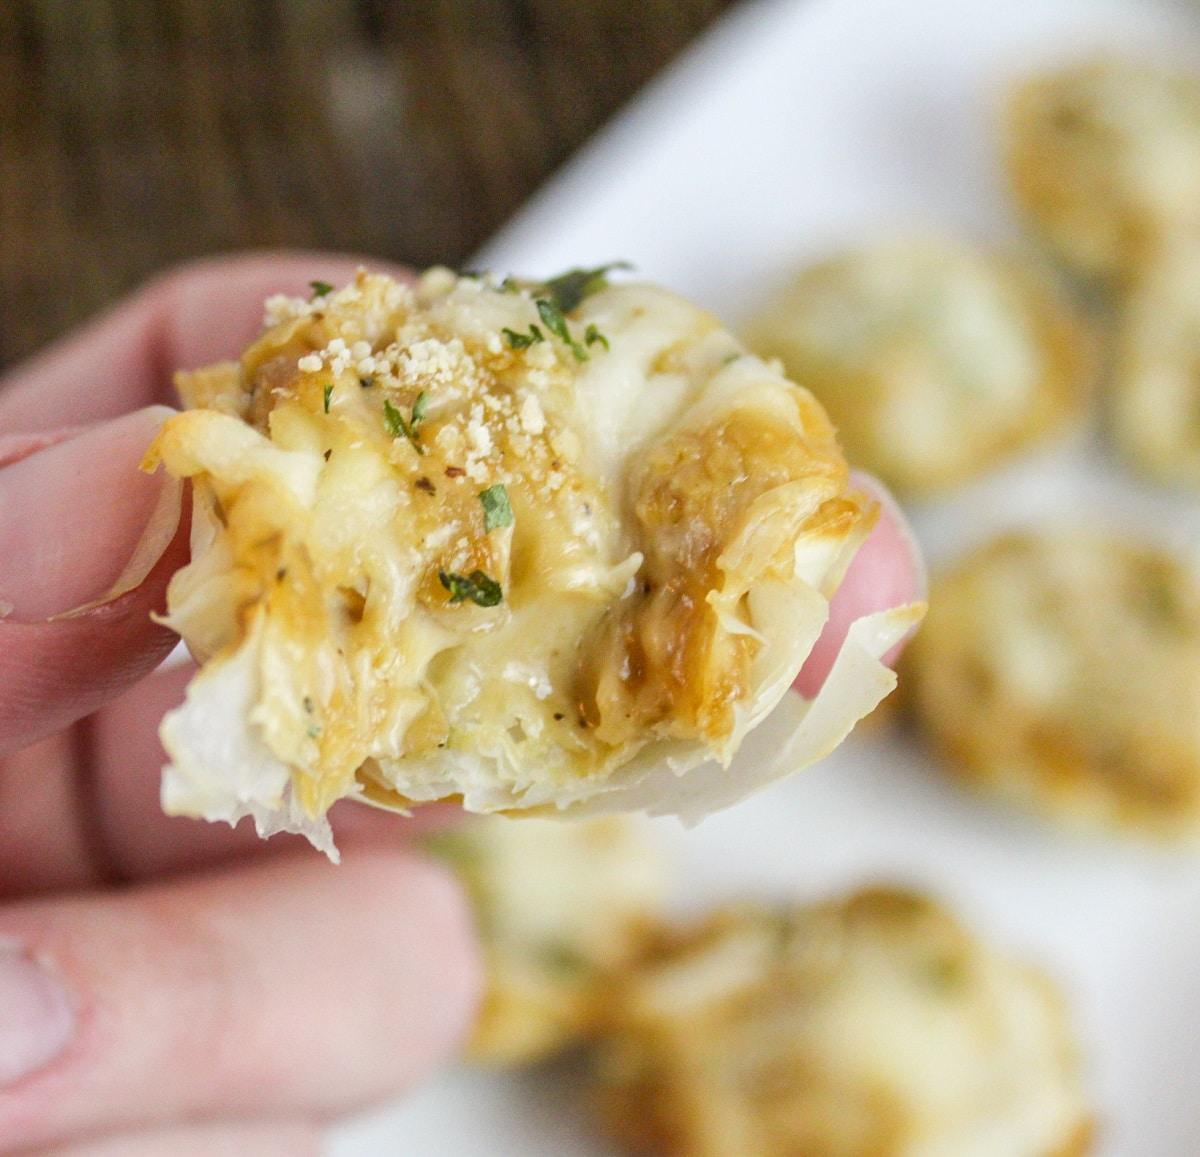 french onion tartlete with bite taken